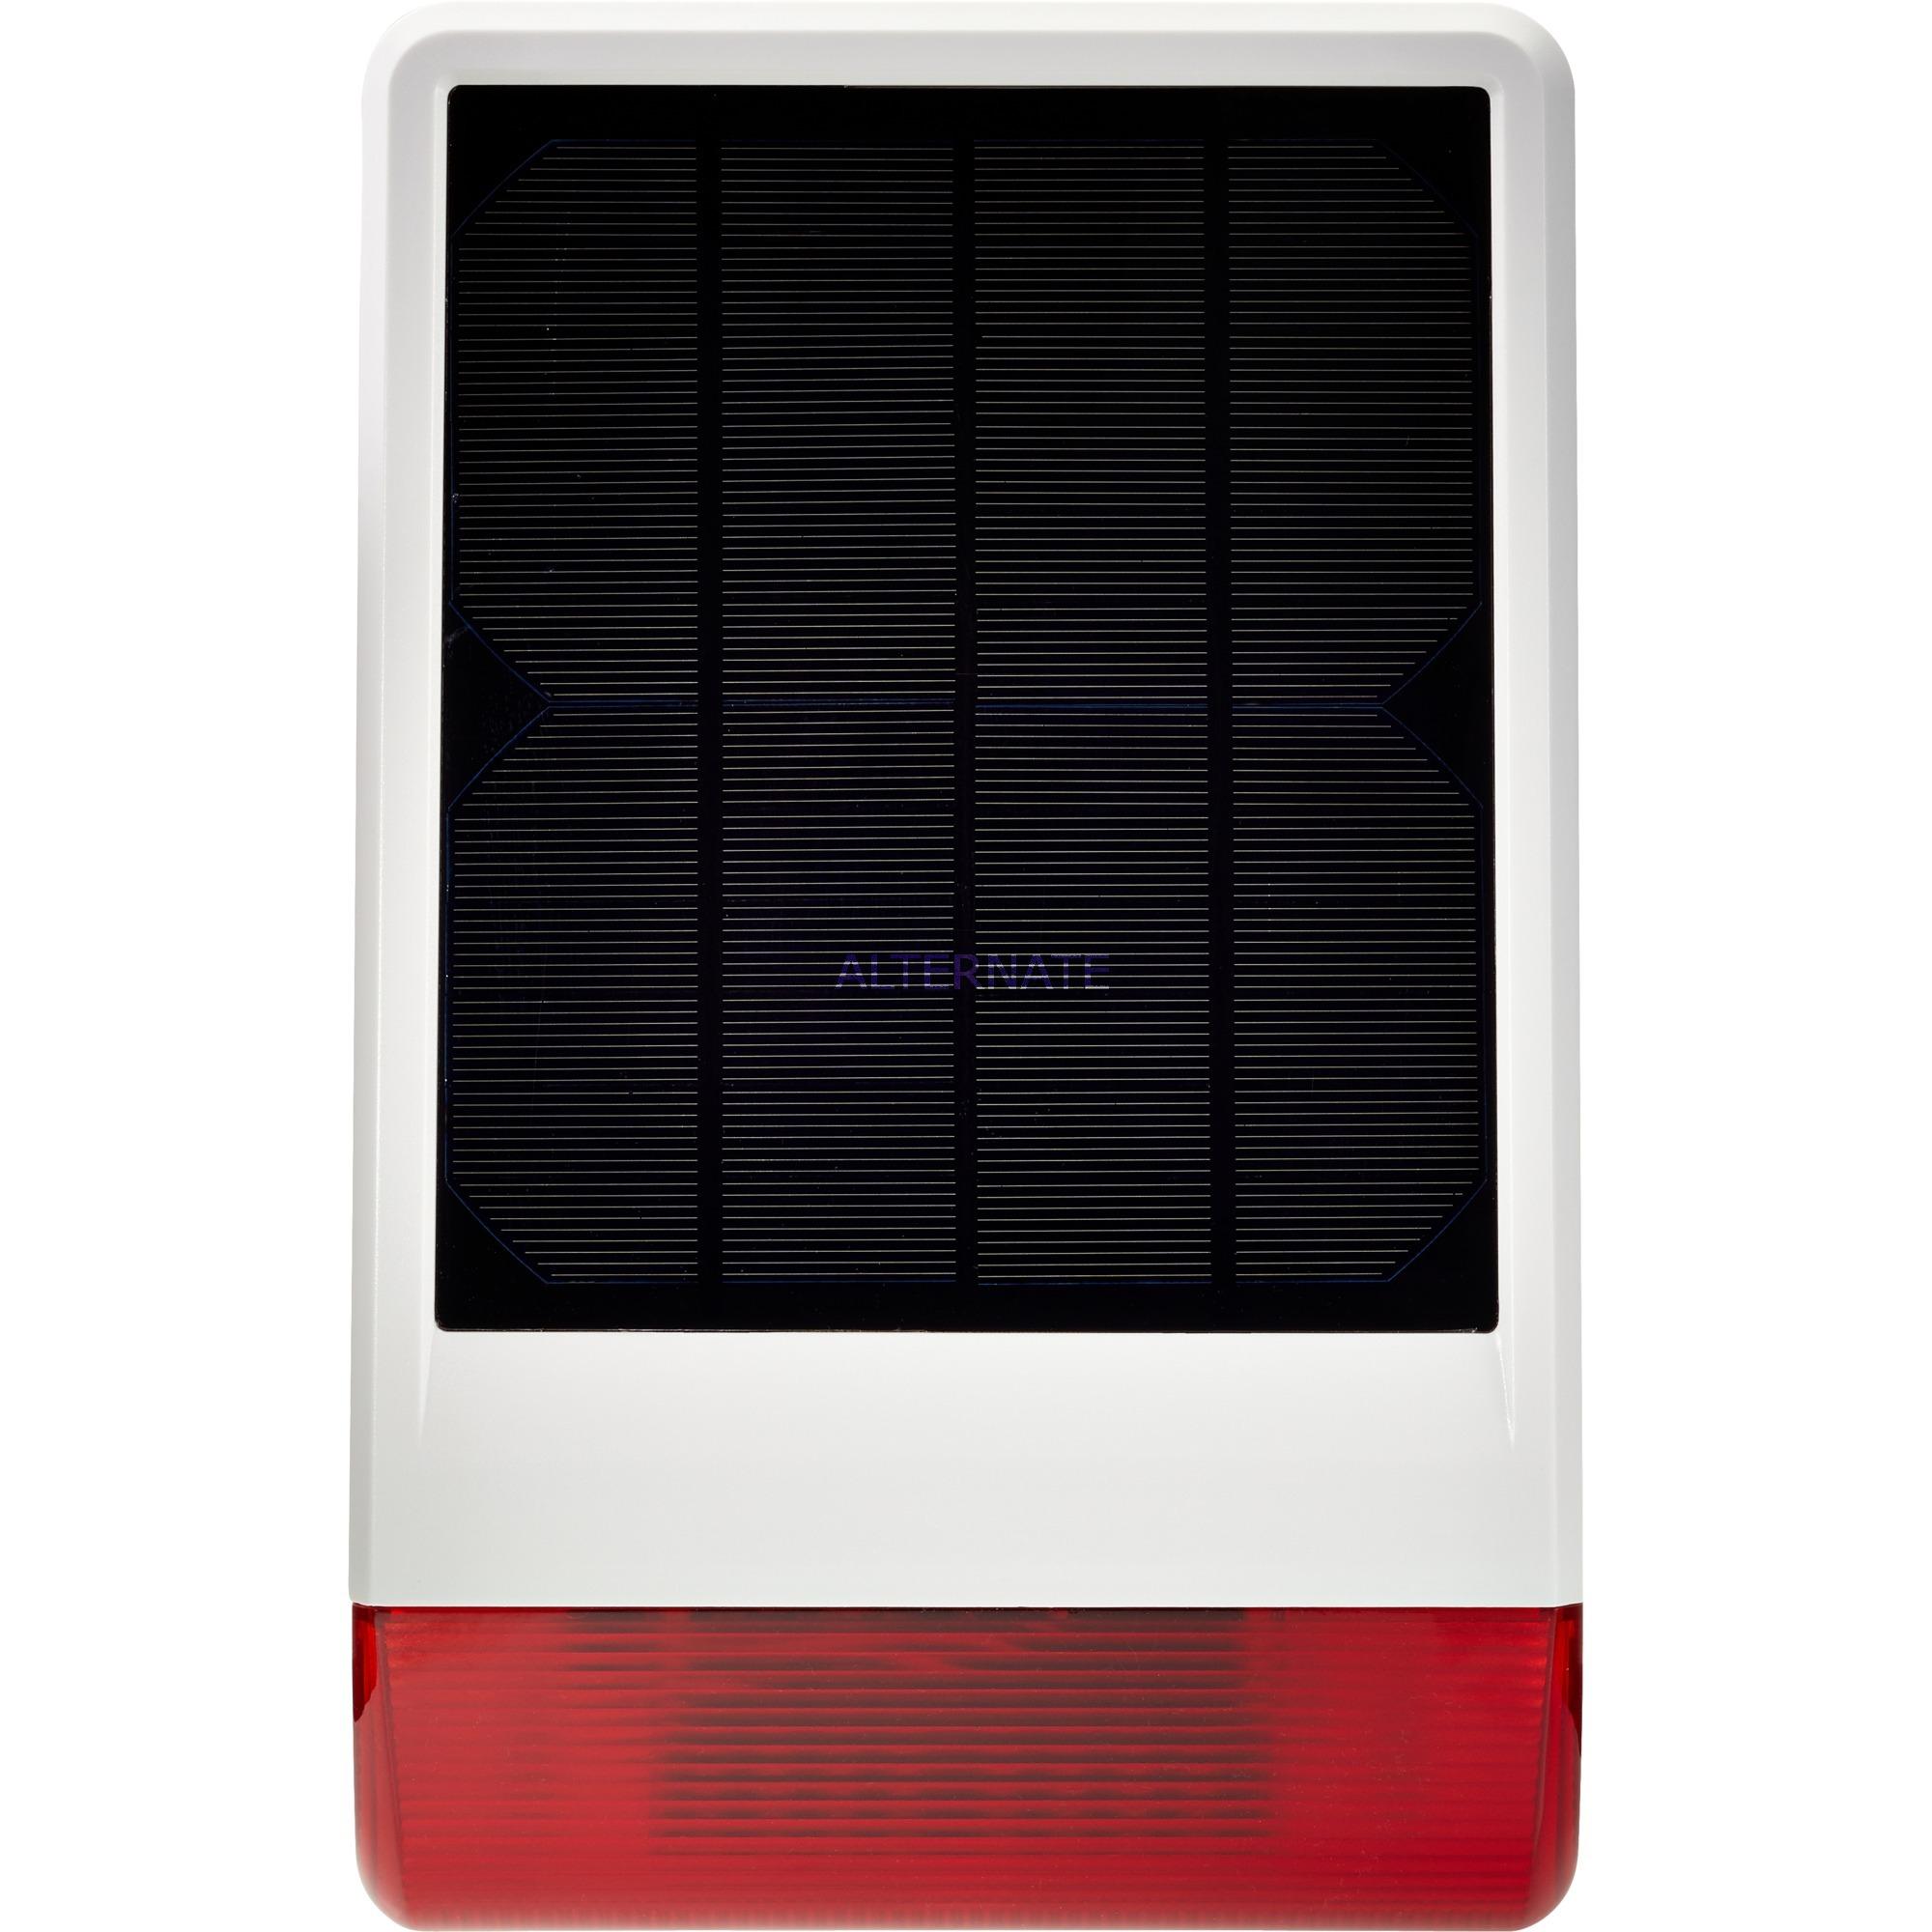 Siren 2 Wireless siren Exterior Rojo, Blanco, Sirena